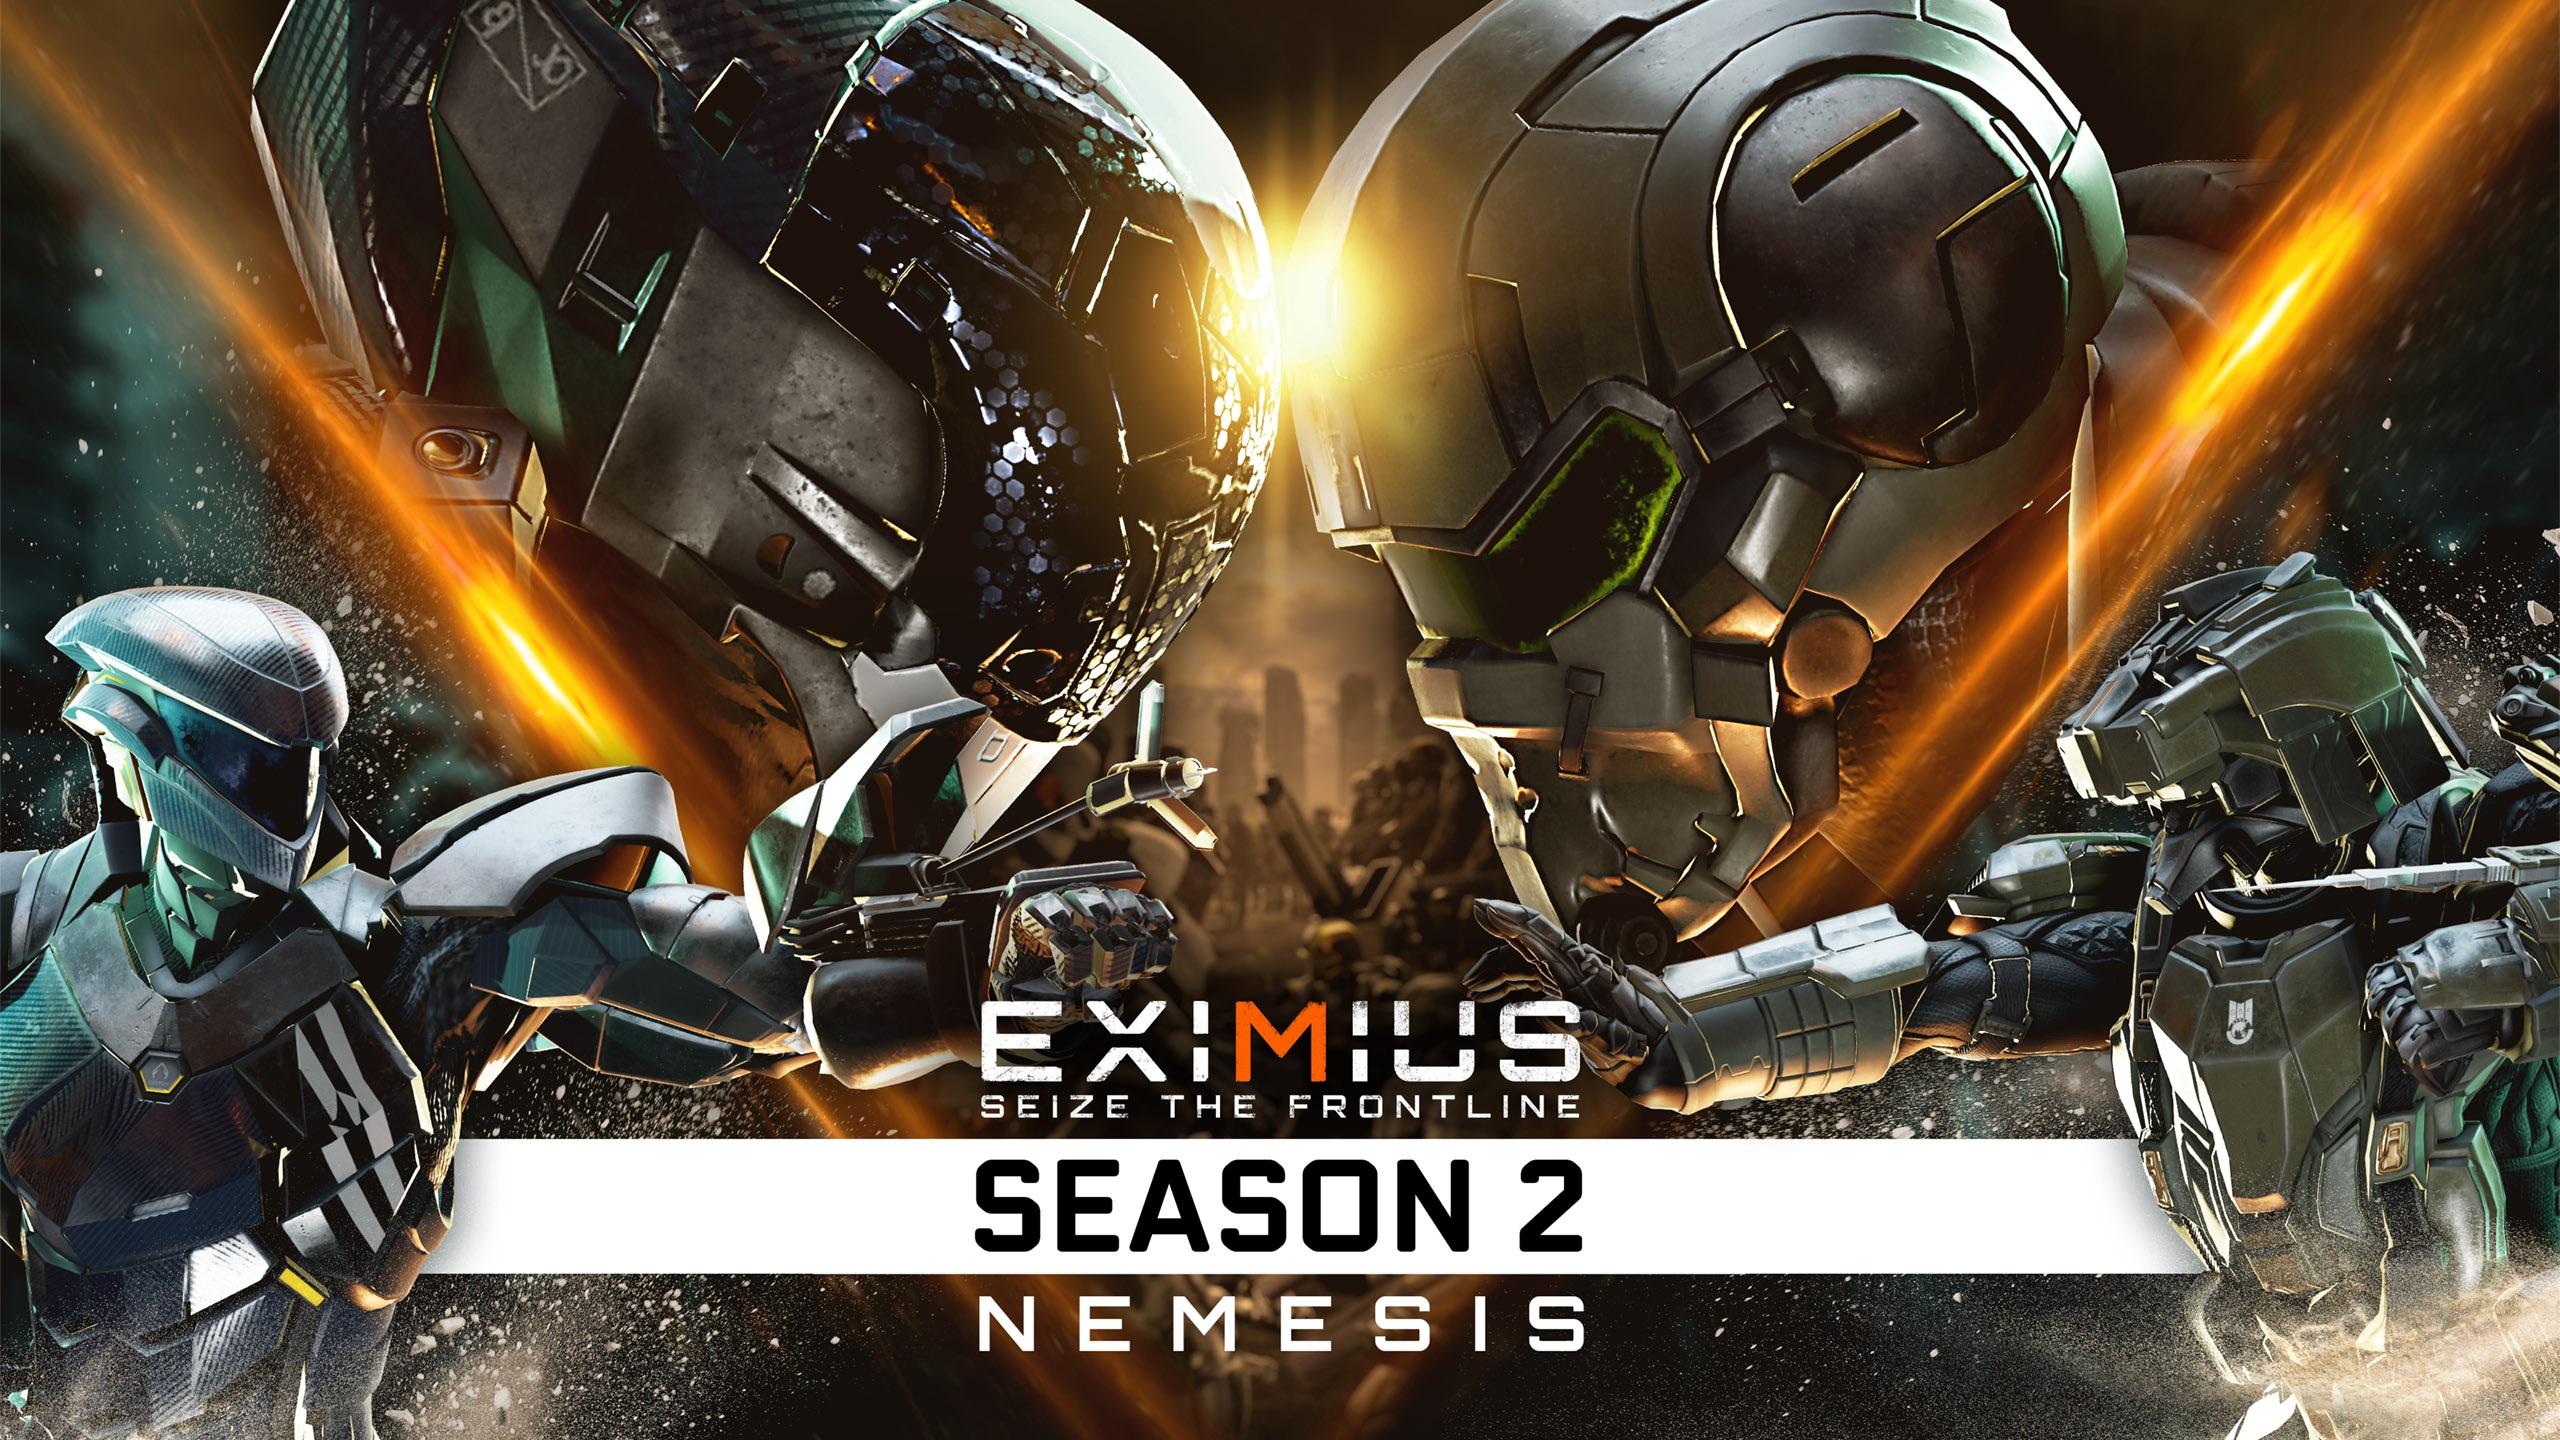 Eximius Seize the Frontline Nemesis Free Download